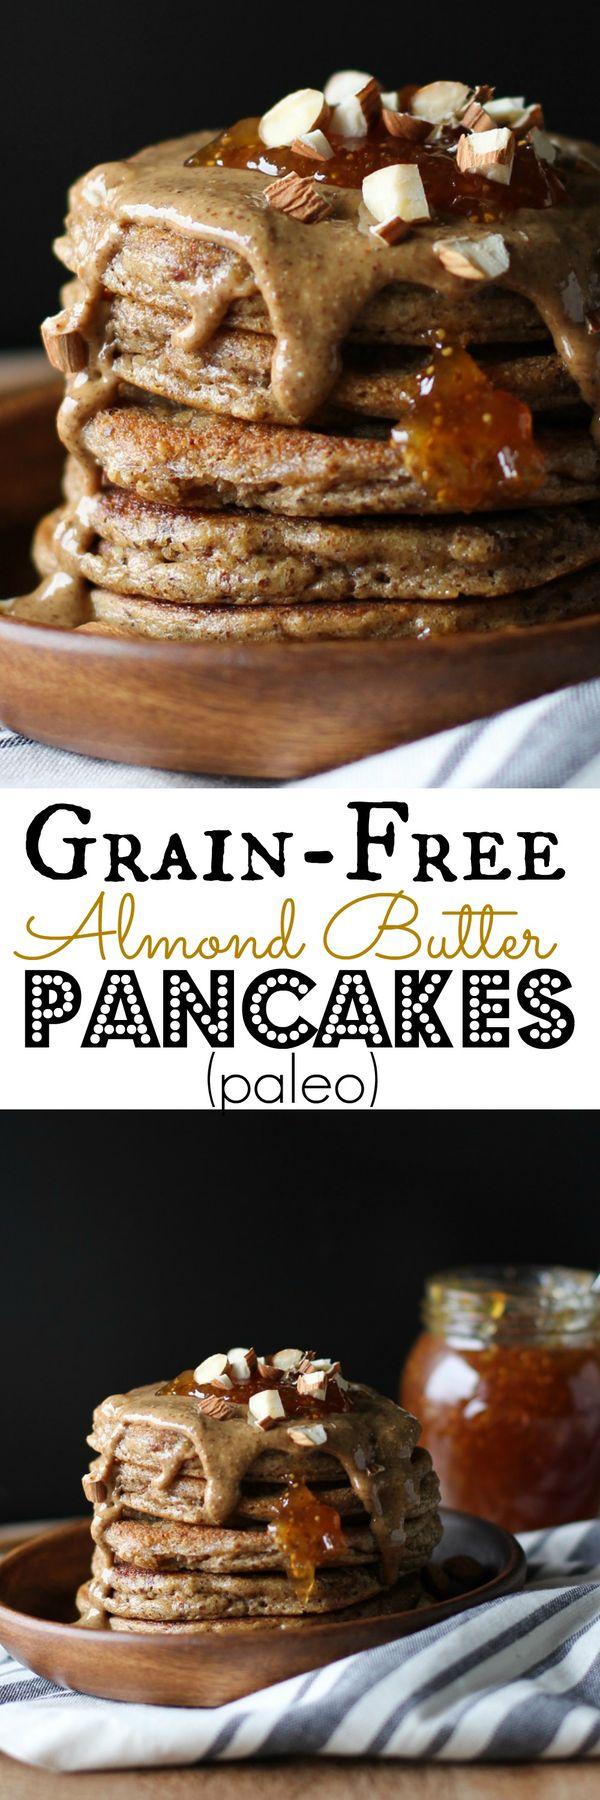 Grain-Free Almond Butter Protein Pancakes - paleo, gluten-free, and healthy   TheRoastedRoot.net #breakfast #recipe